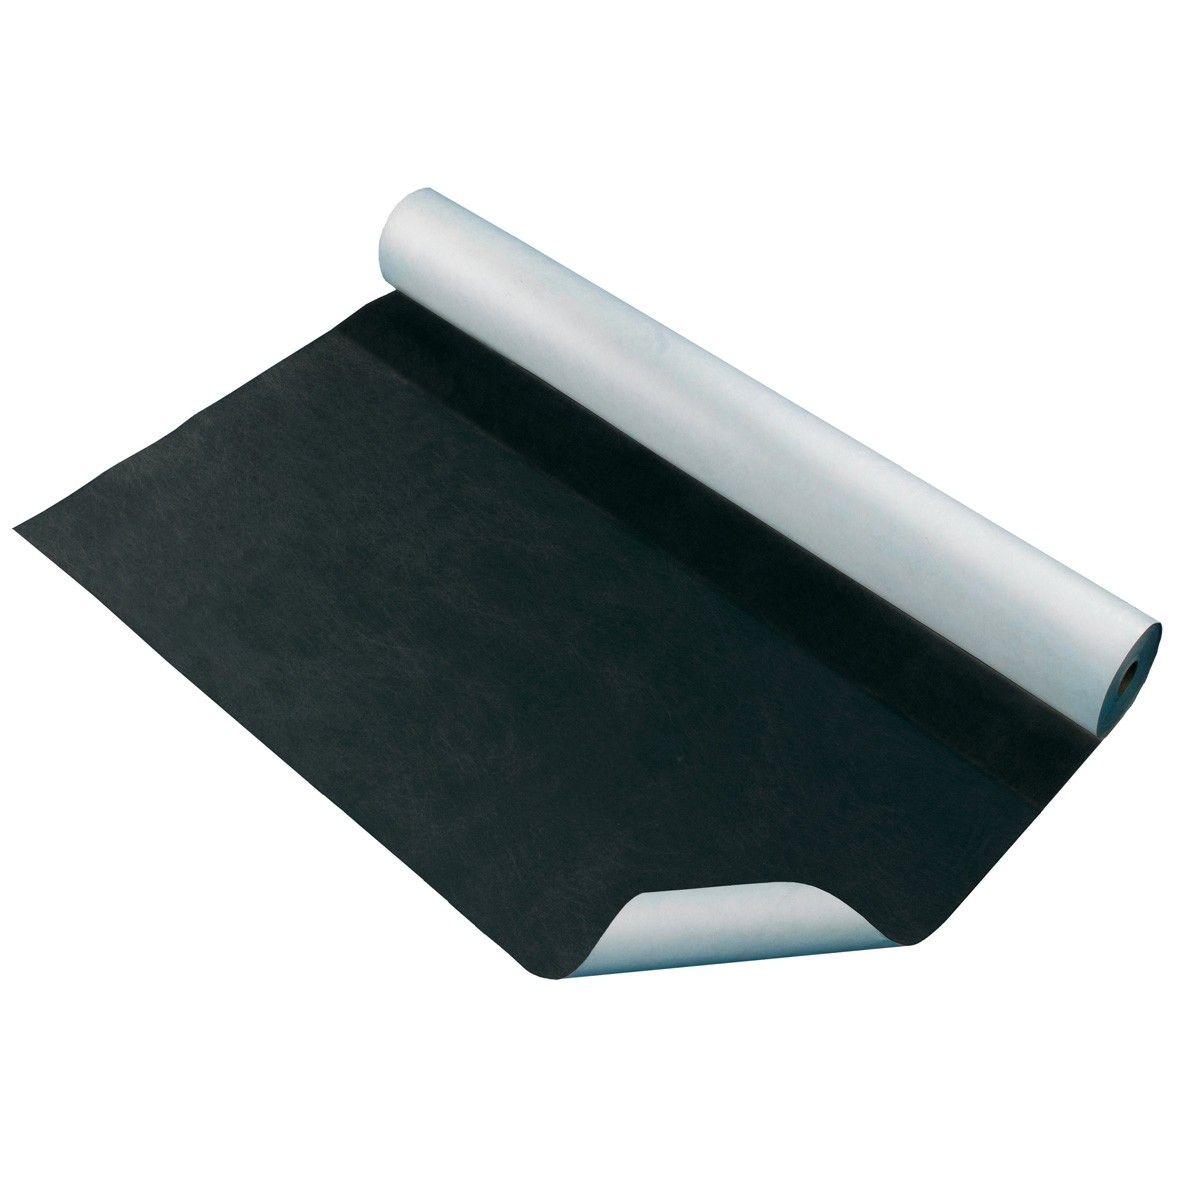 Tyvek Uv Facade Breathable Membrane For Cladding 50mtr X 1 5mtr Rainscreen Cladding Cladding Cladding Systems